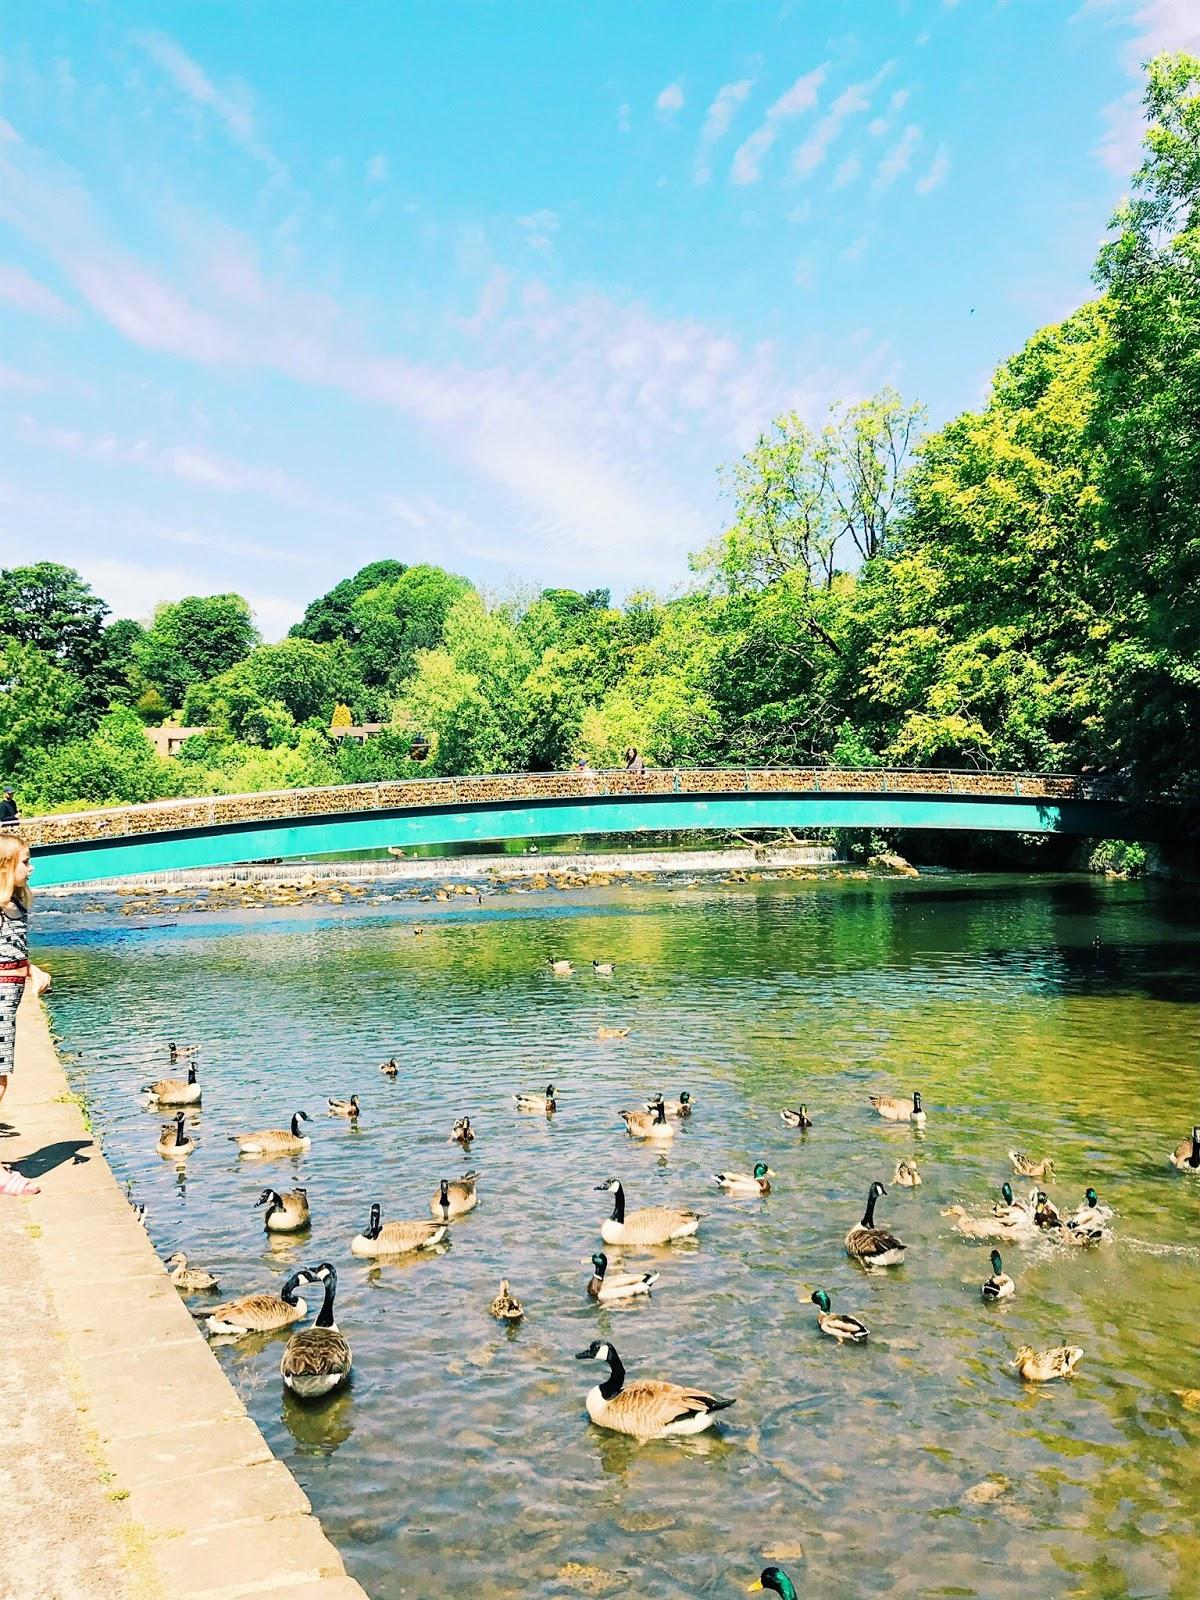 Bakewell Lovelock Bridge, Derbyshire